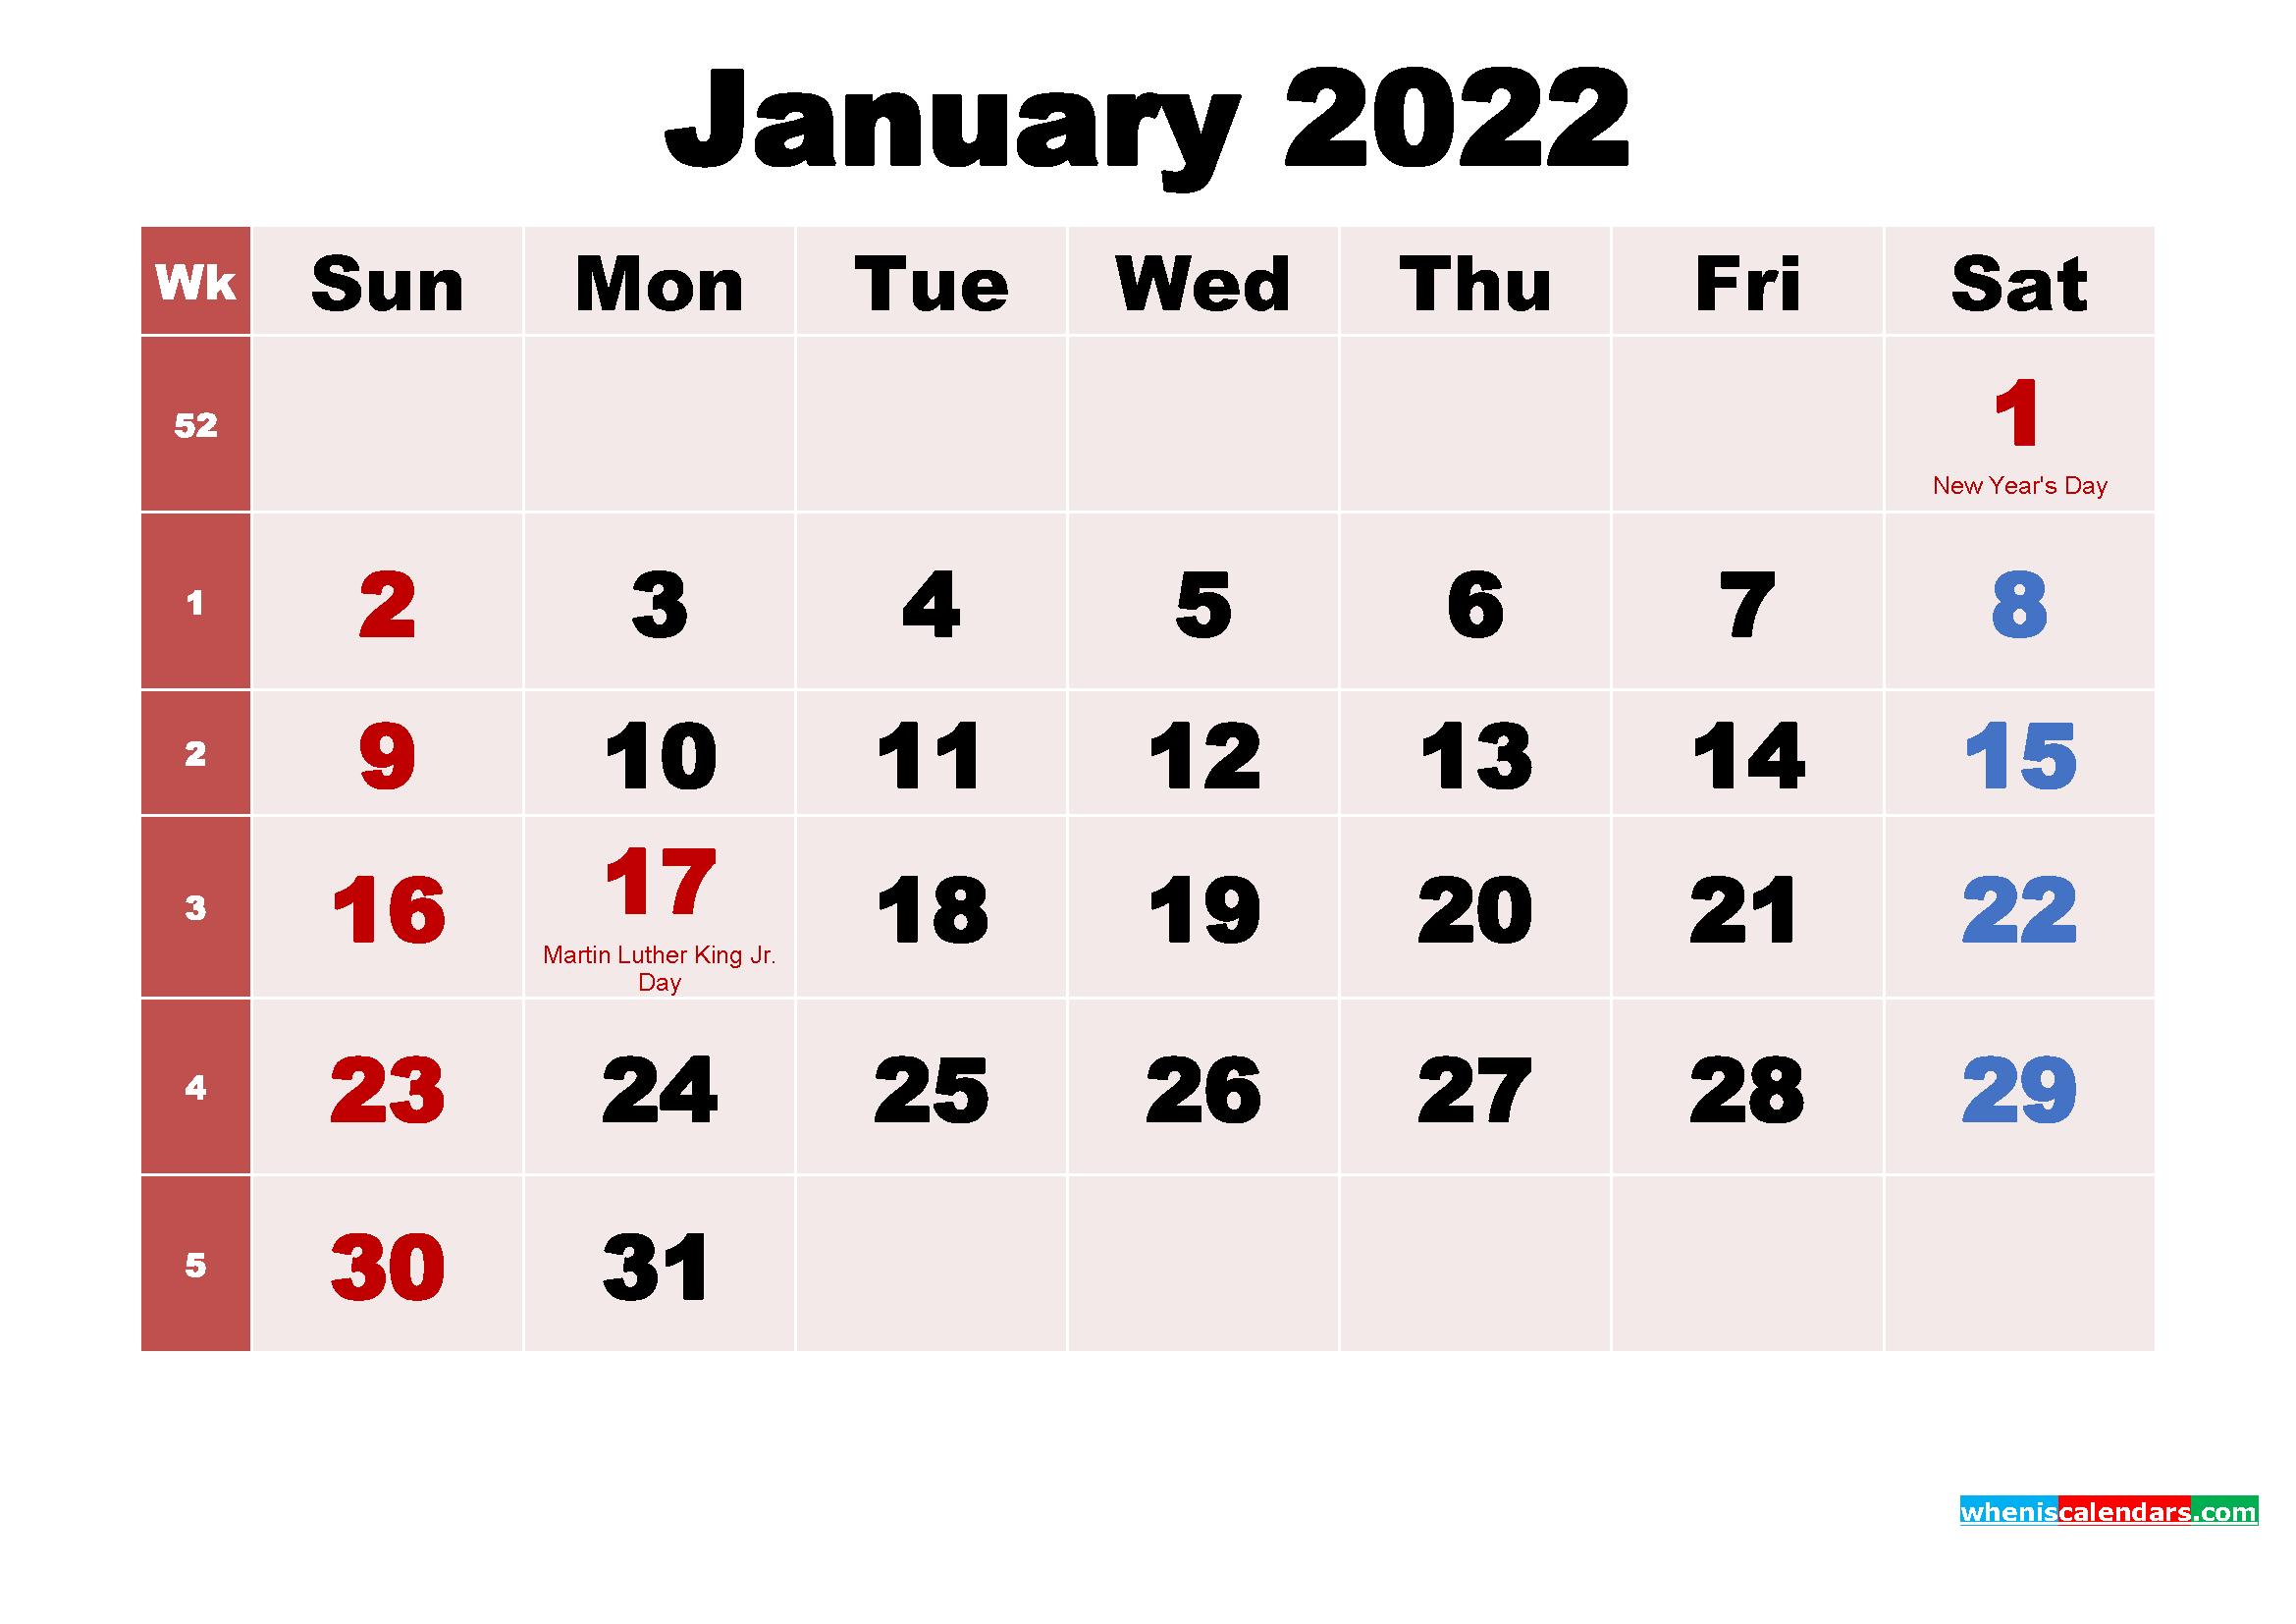 Free Printable January 2022 Calendar With Holidays As Word With Regard To January Printable Calendar 2022